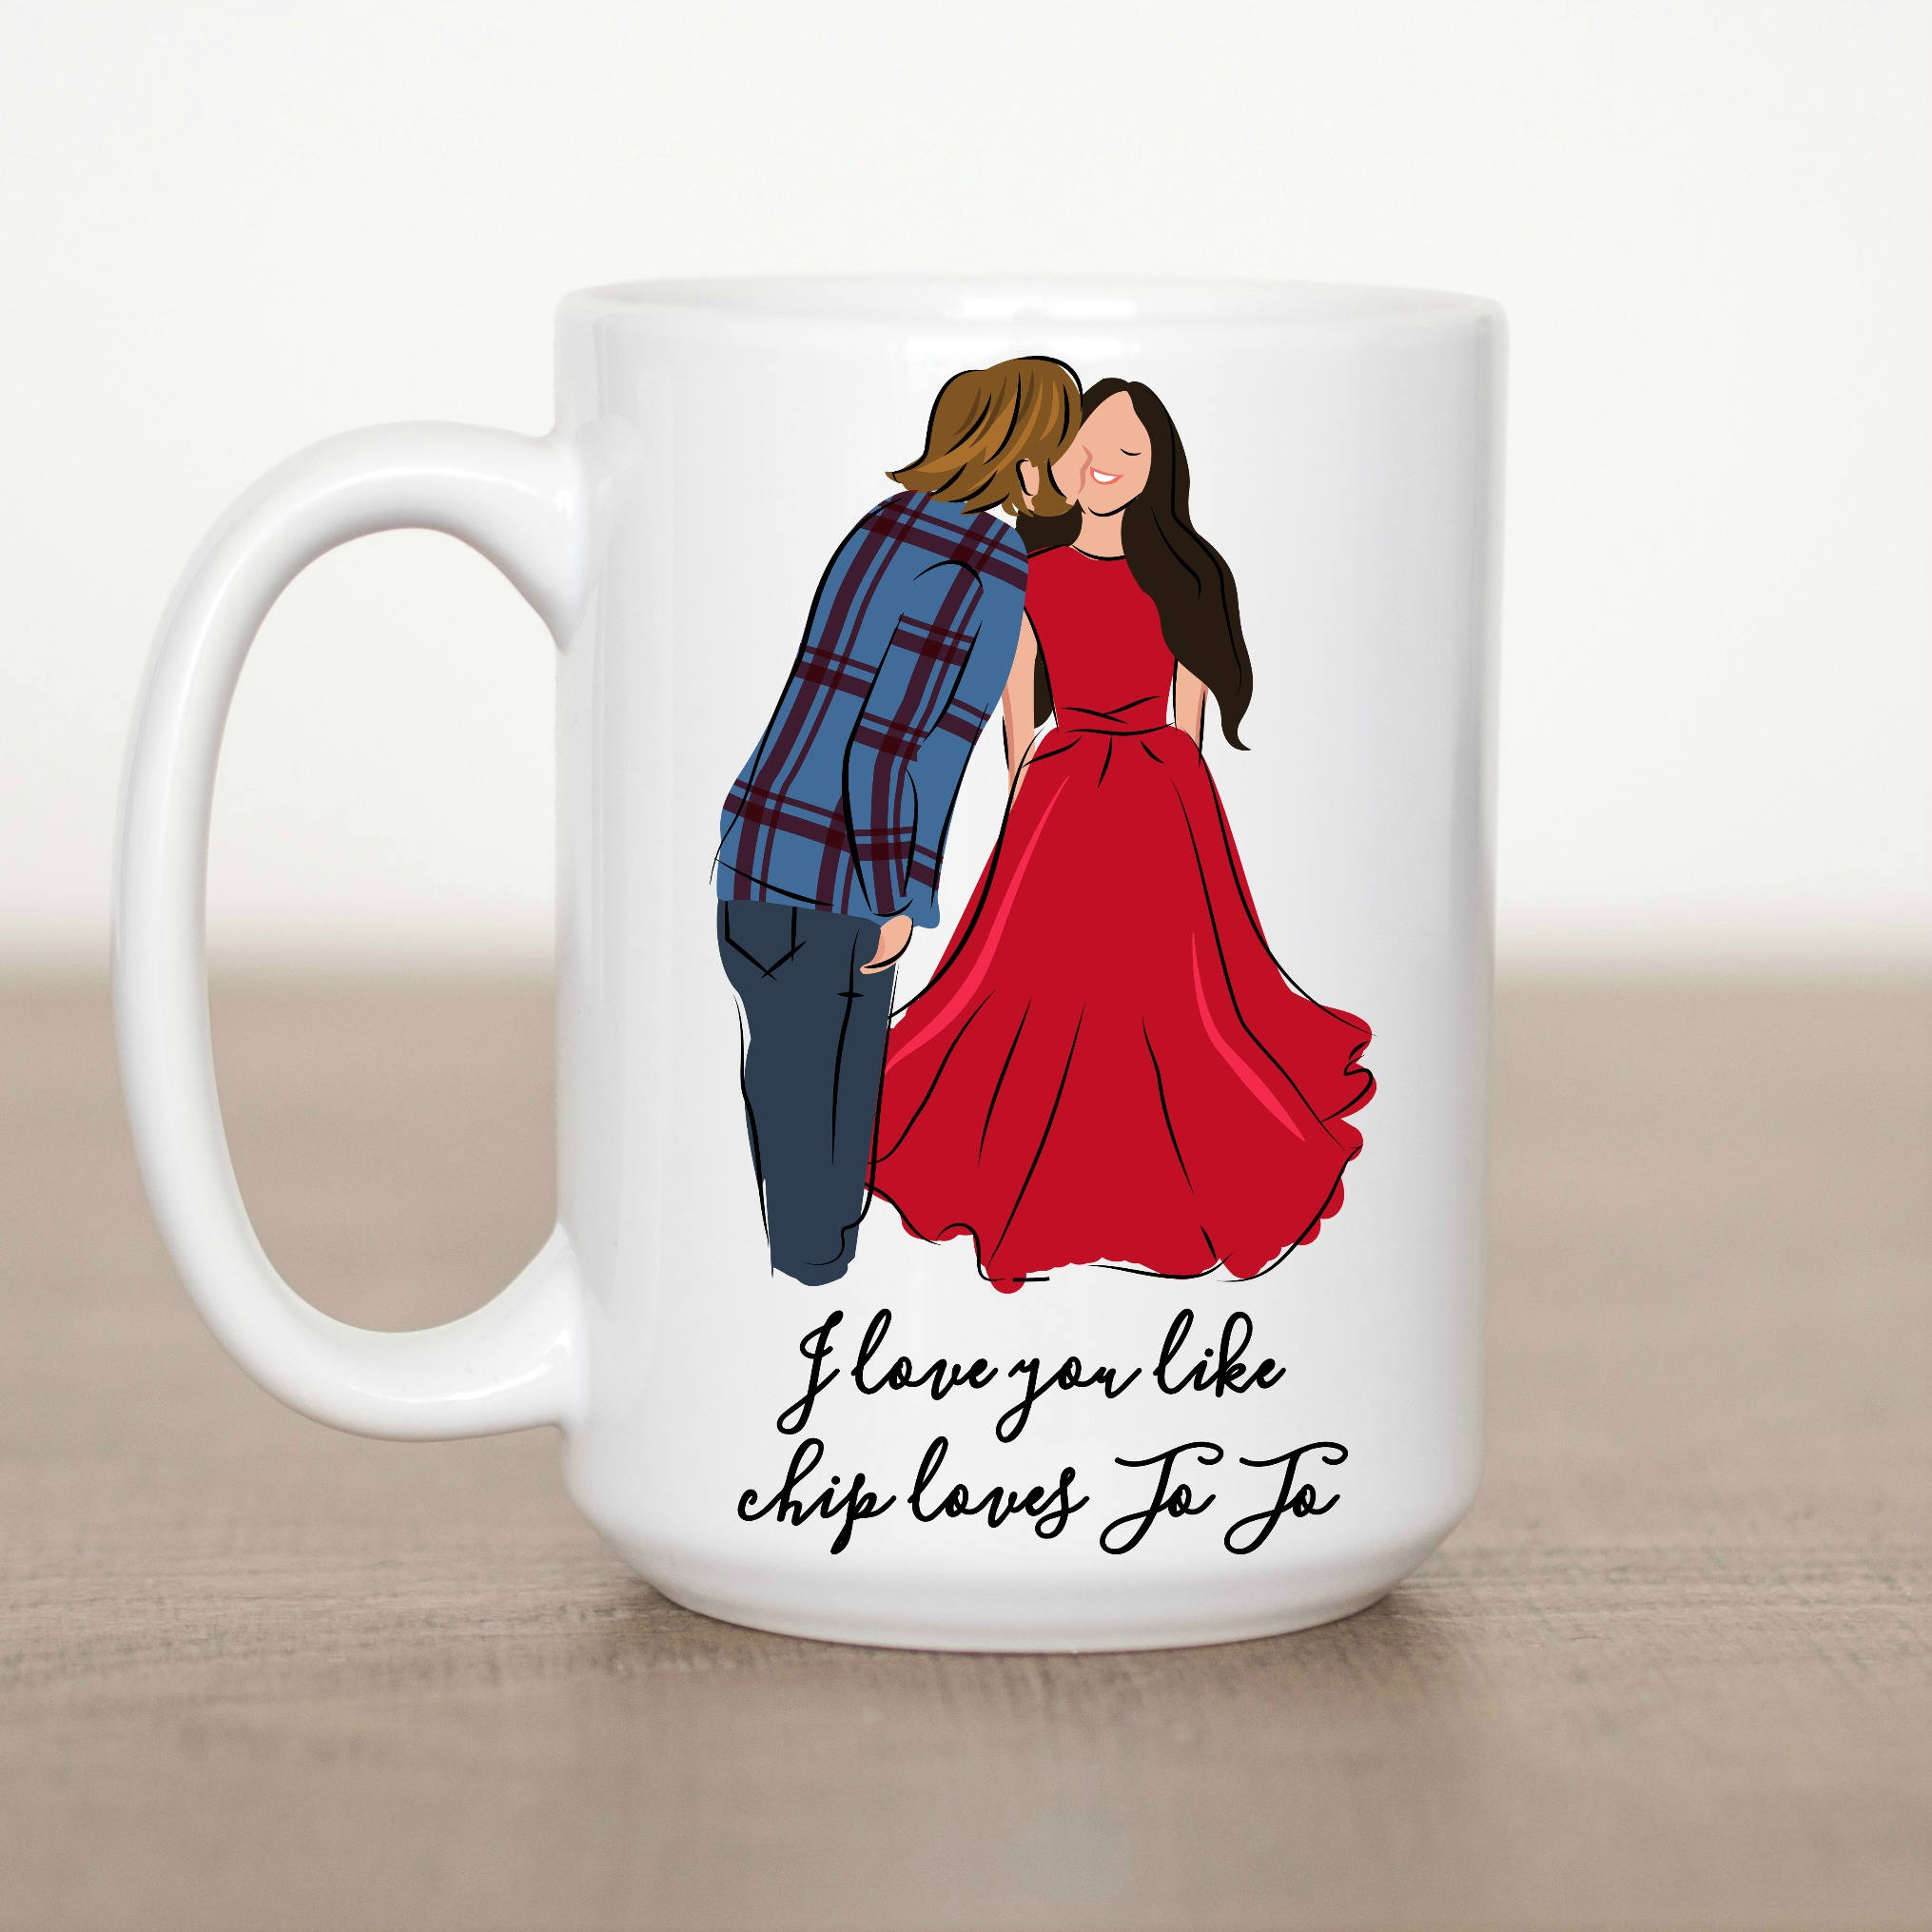 love you like chip loves jo jo mug